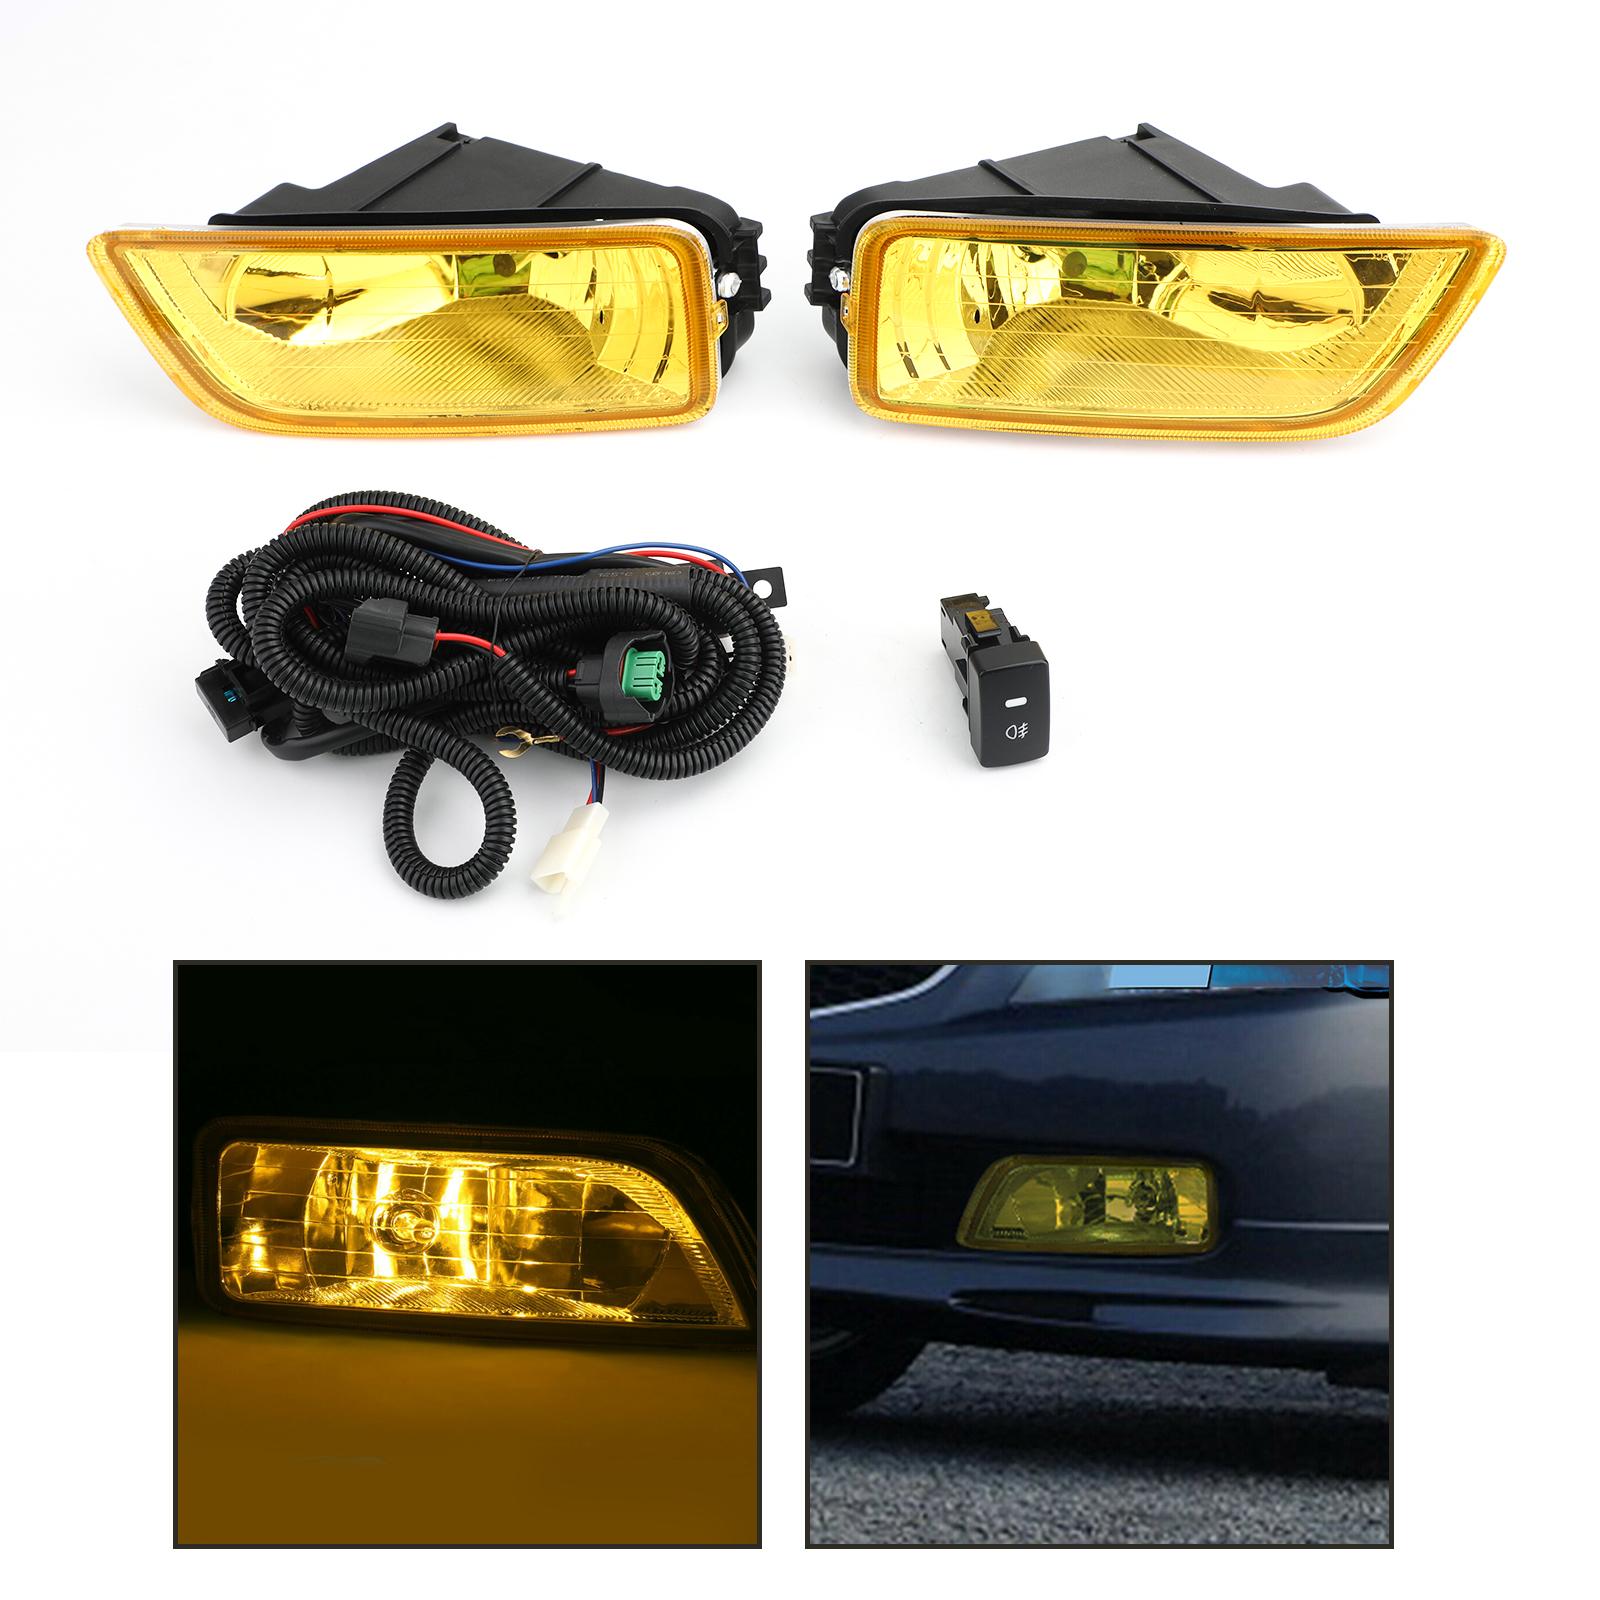 Yellow Lens Fog Lights + Switch For 2003-2007 Honda Accord